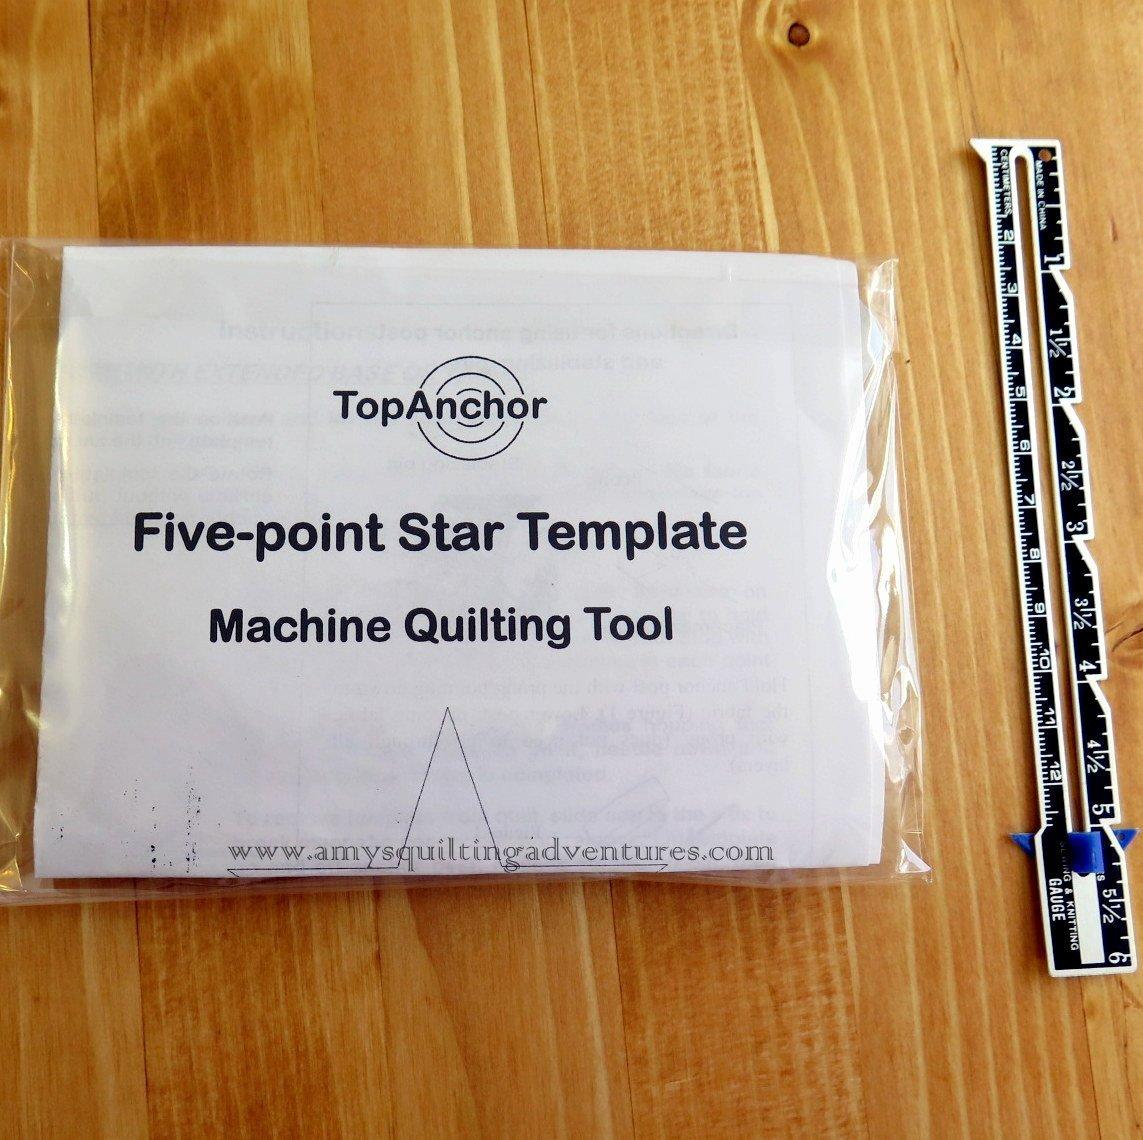 10 Inch Star Template Beautiful topanchor Five Point Star 6 Inch